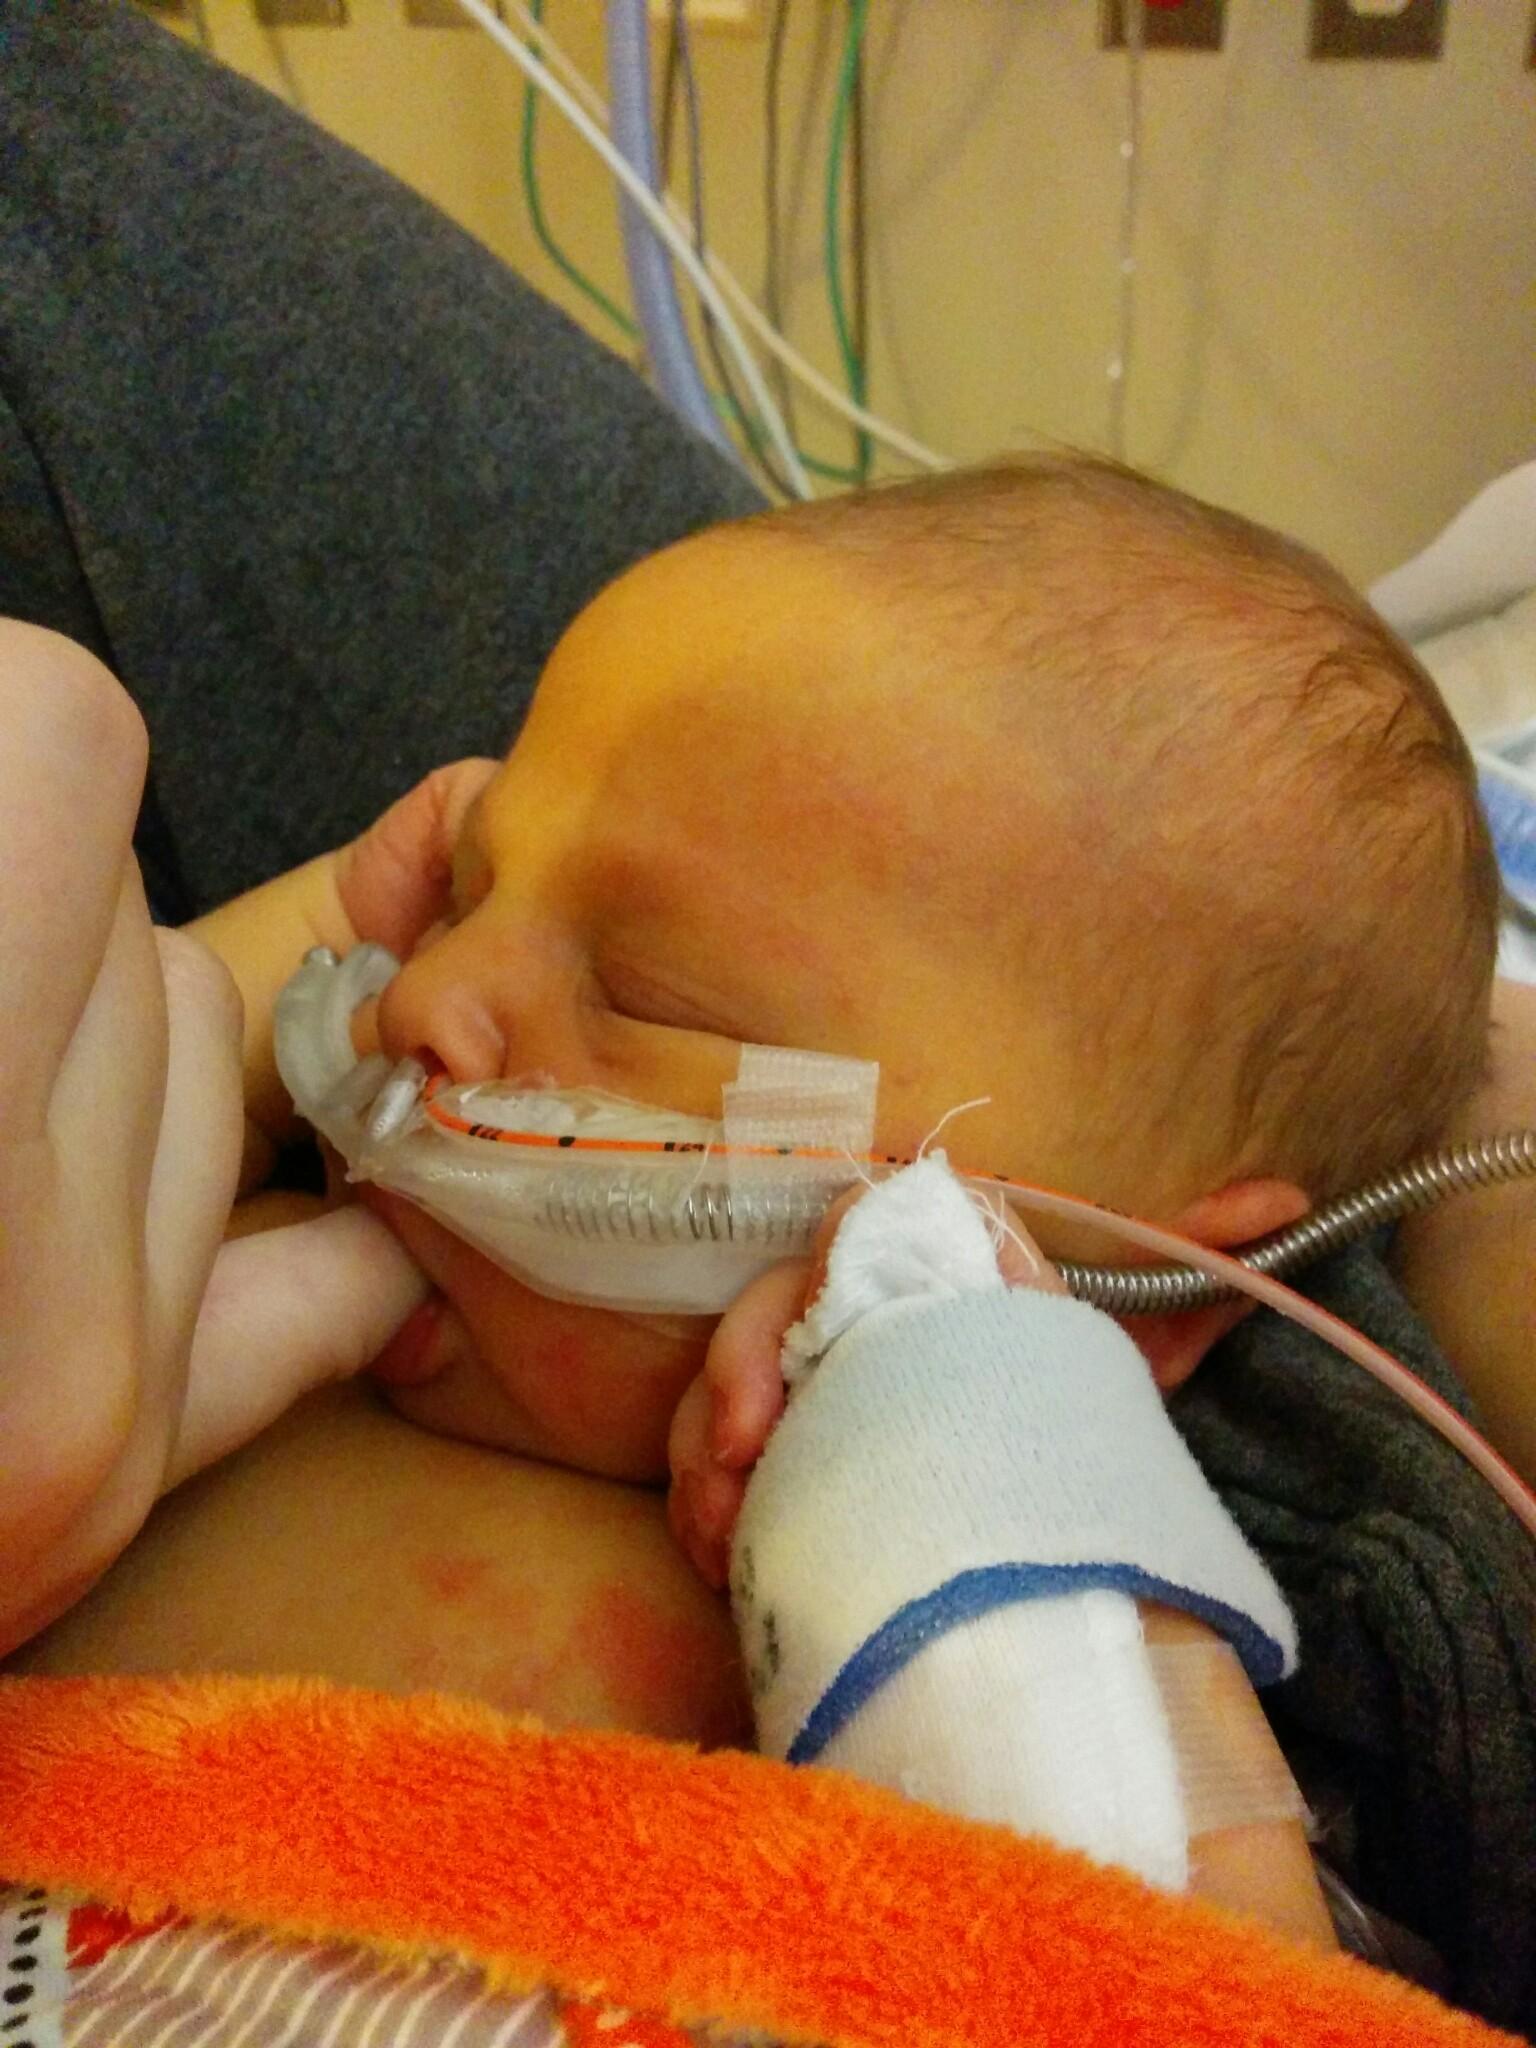 Adages Explained: Never Wake a Sleeping Baby